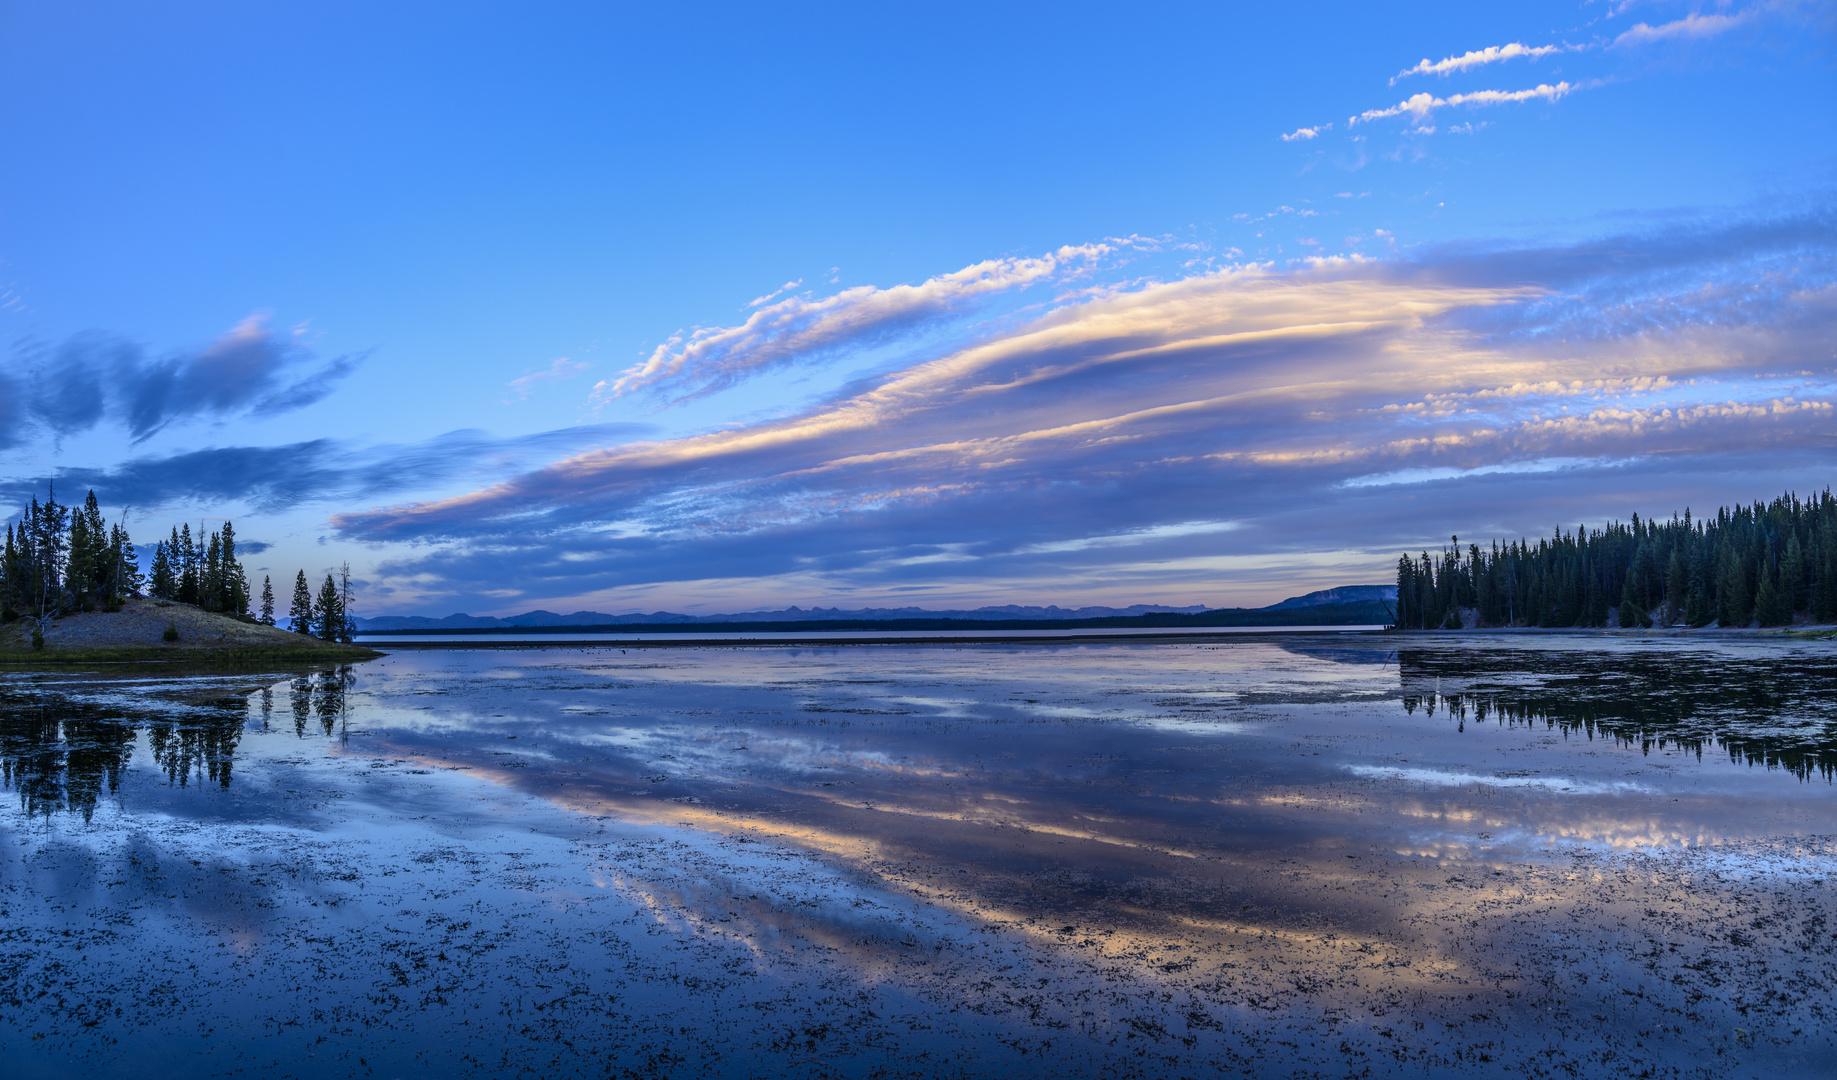 Yellowstone Lake, Wyoming, USA